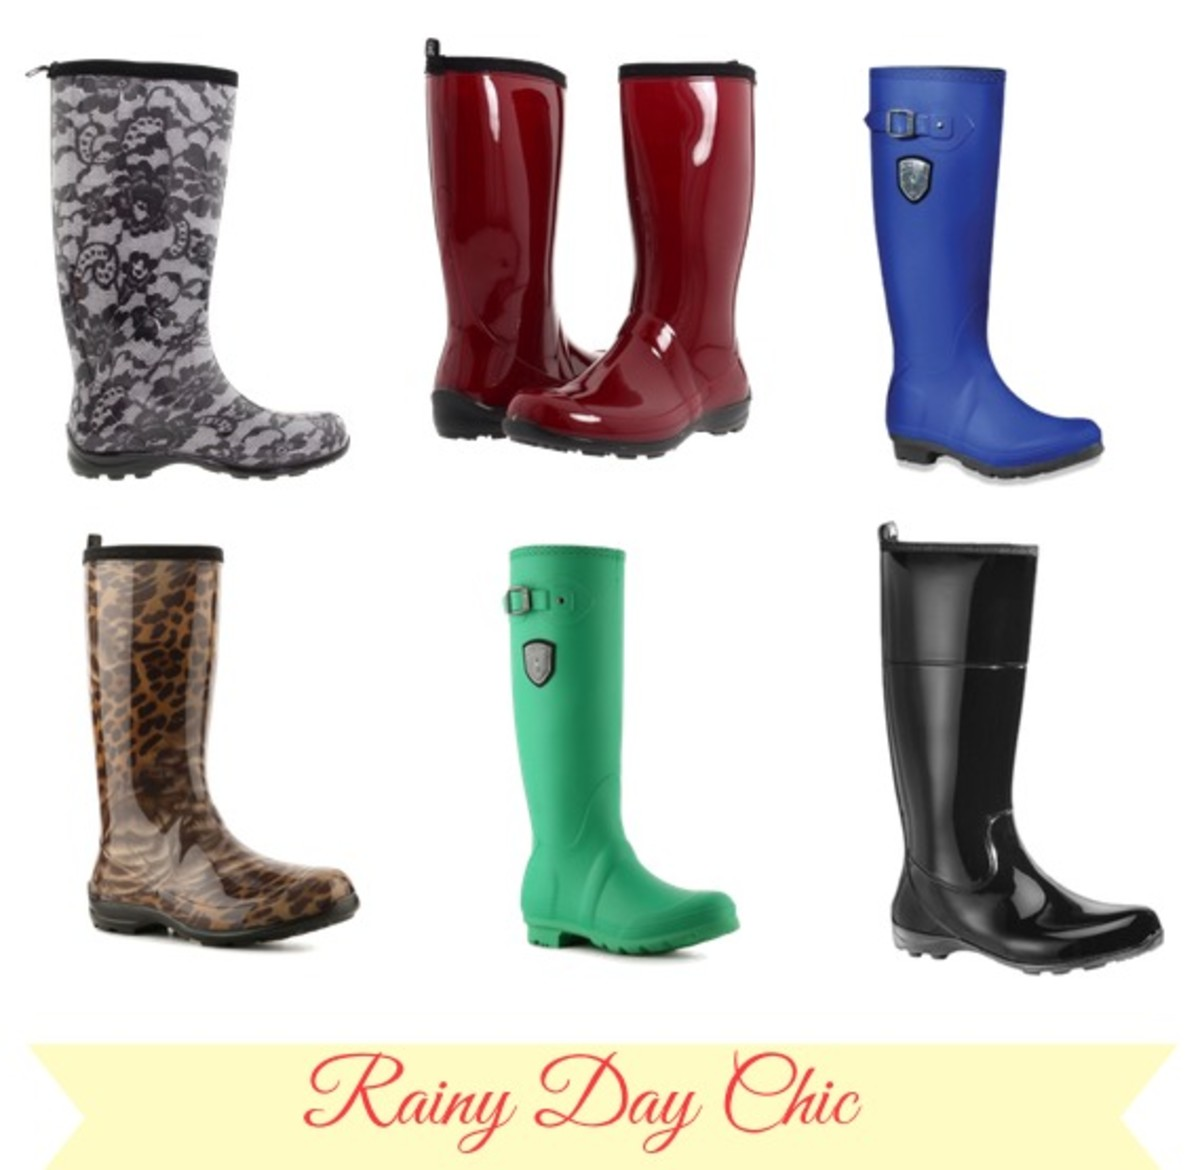 Rainy Day CHic, rain boots